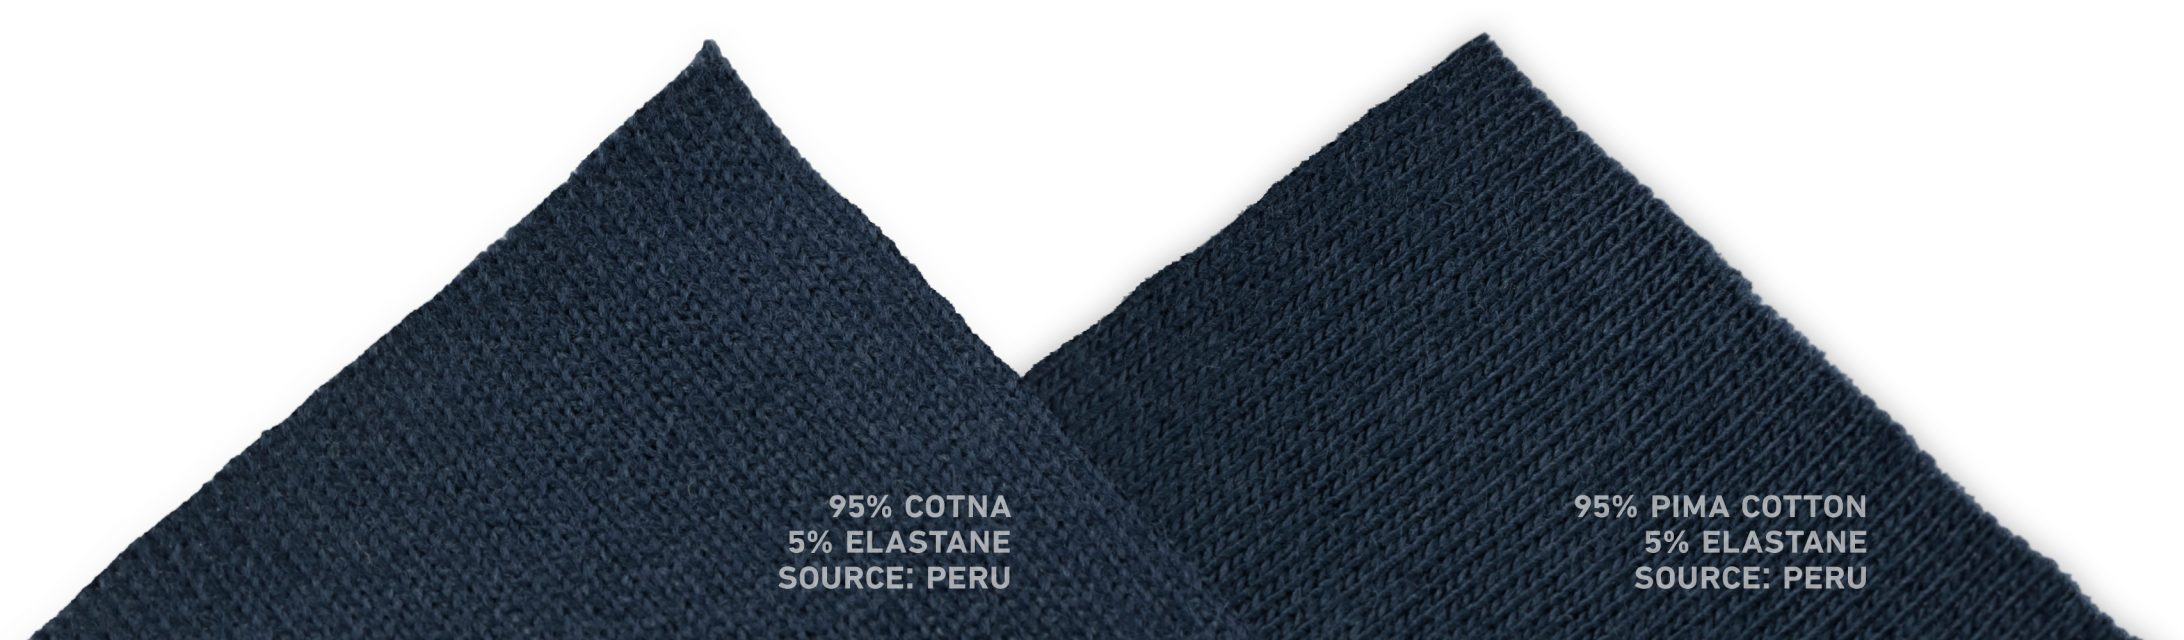 StringKing Apparel T Shirt Feature Premium Materials